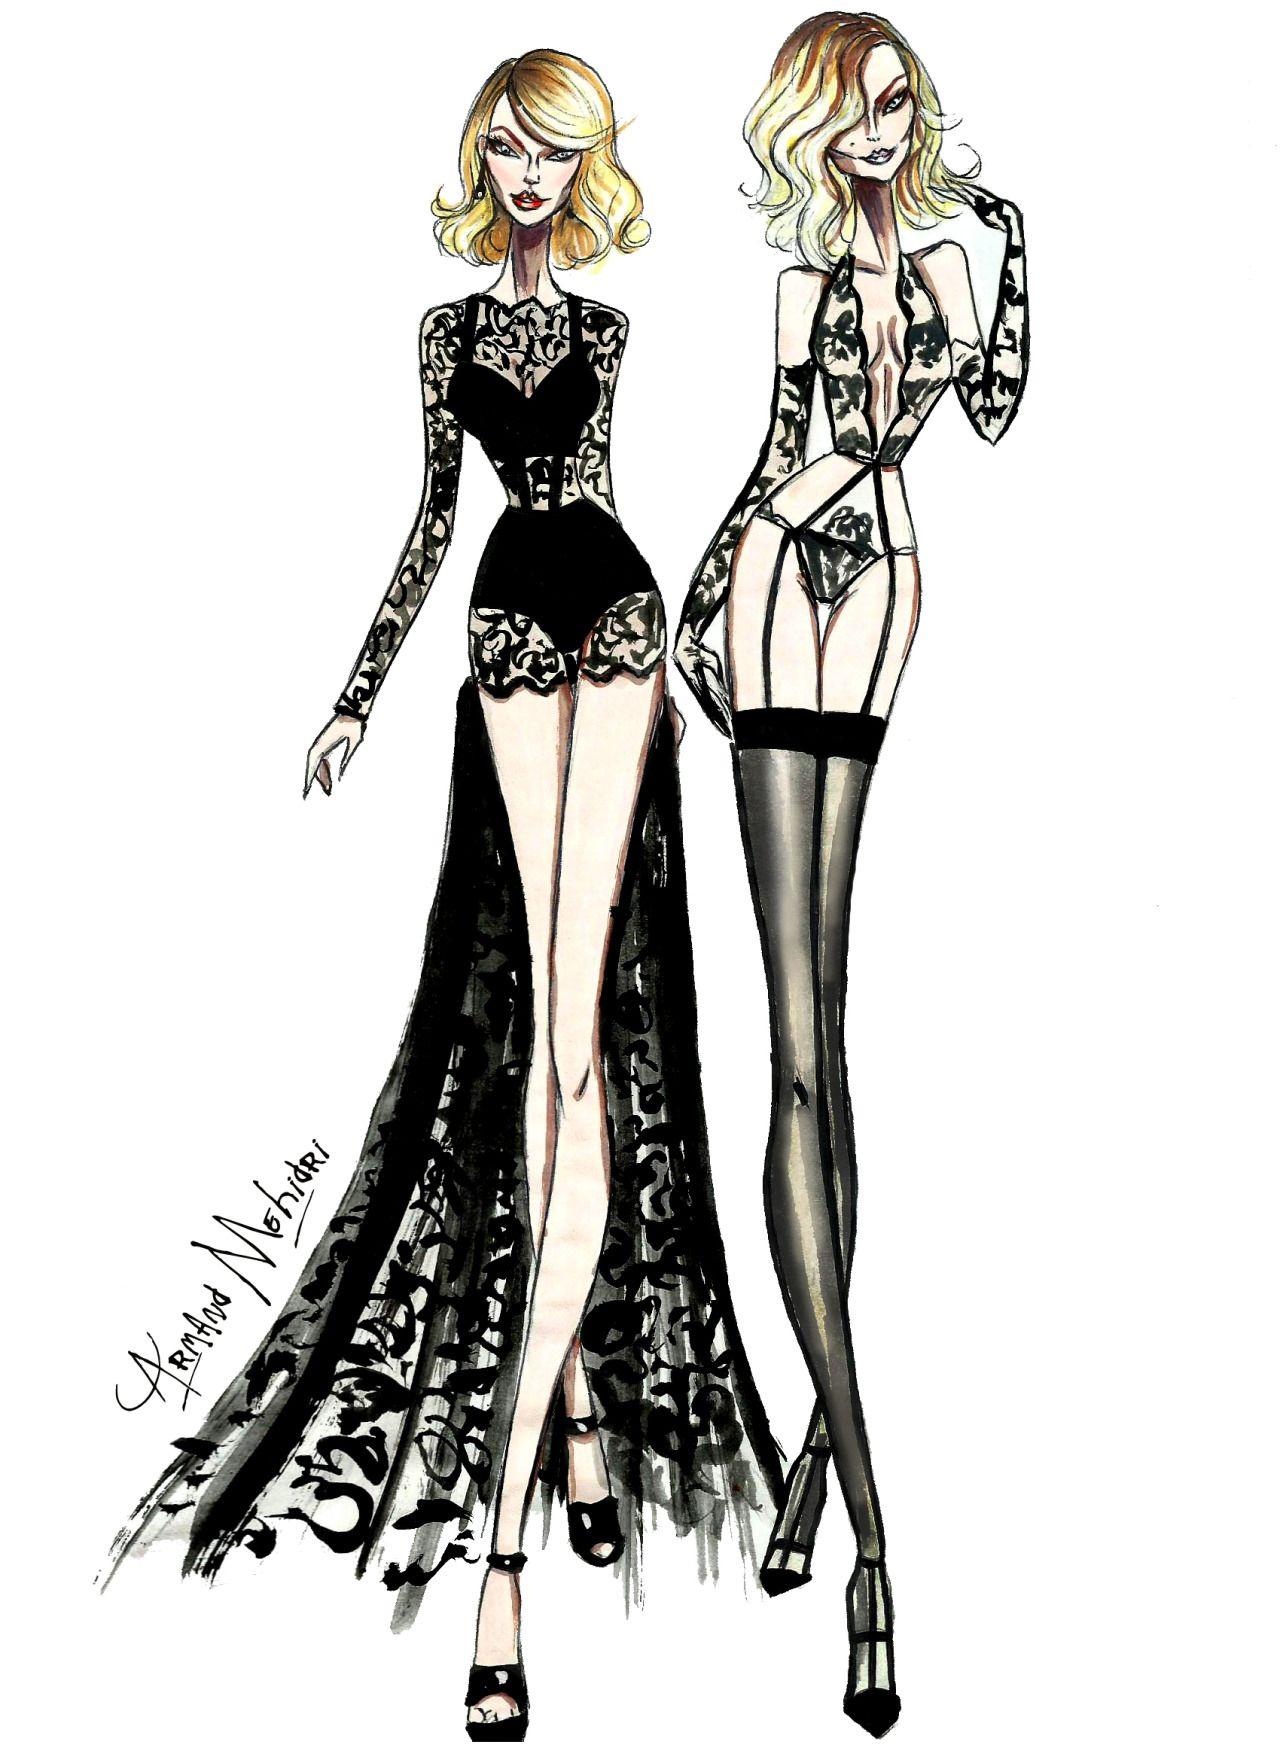 Taylor Swift & Karlie Kloss - by Armand Mehidri